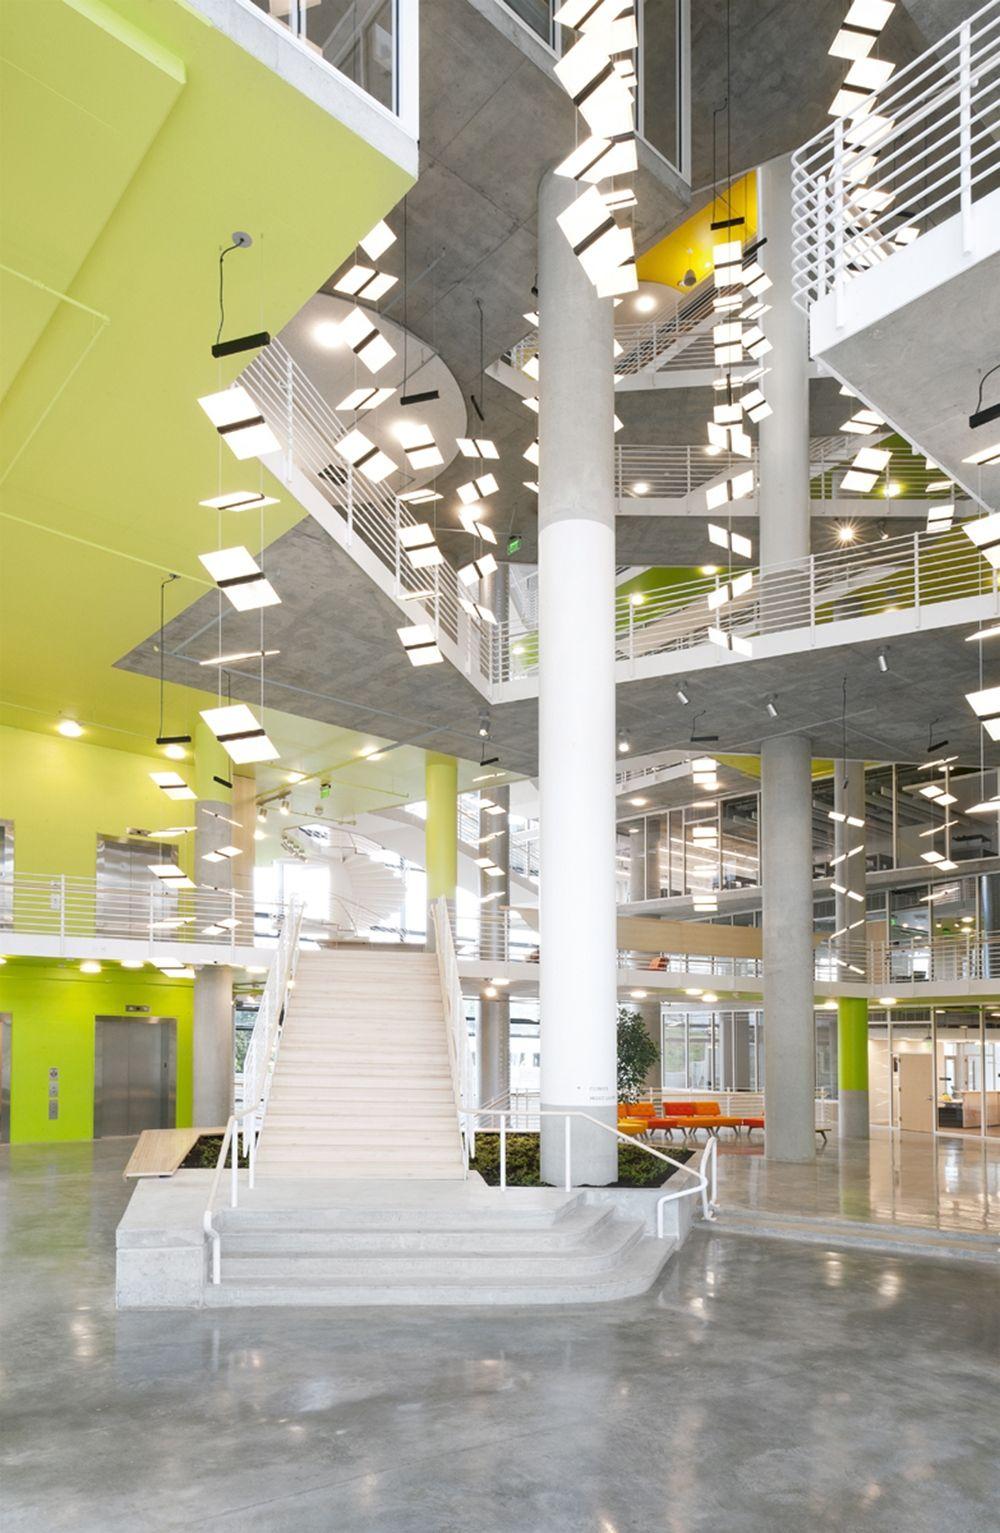 Centro de leyes john y frances angelos universidad de for Neue architektur stuttgart